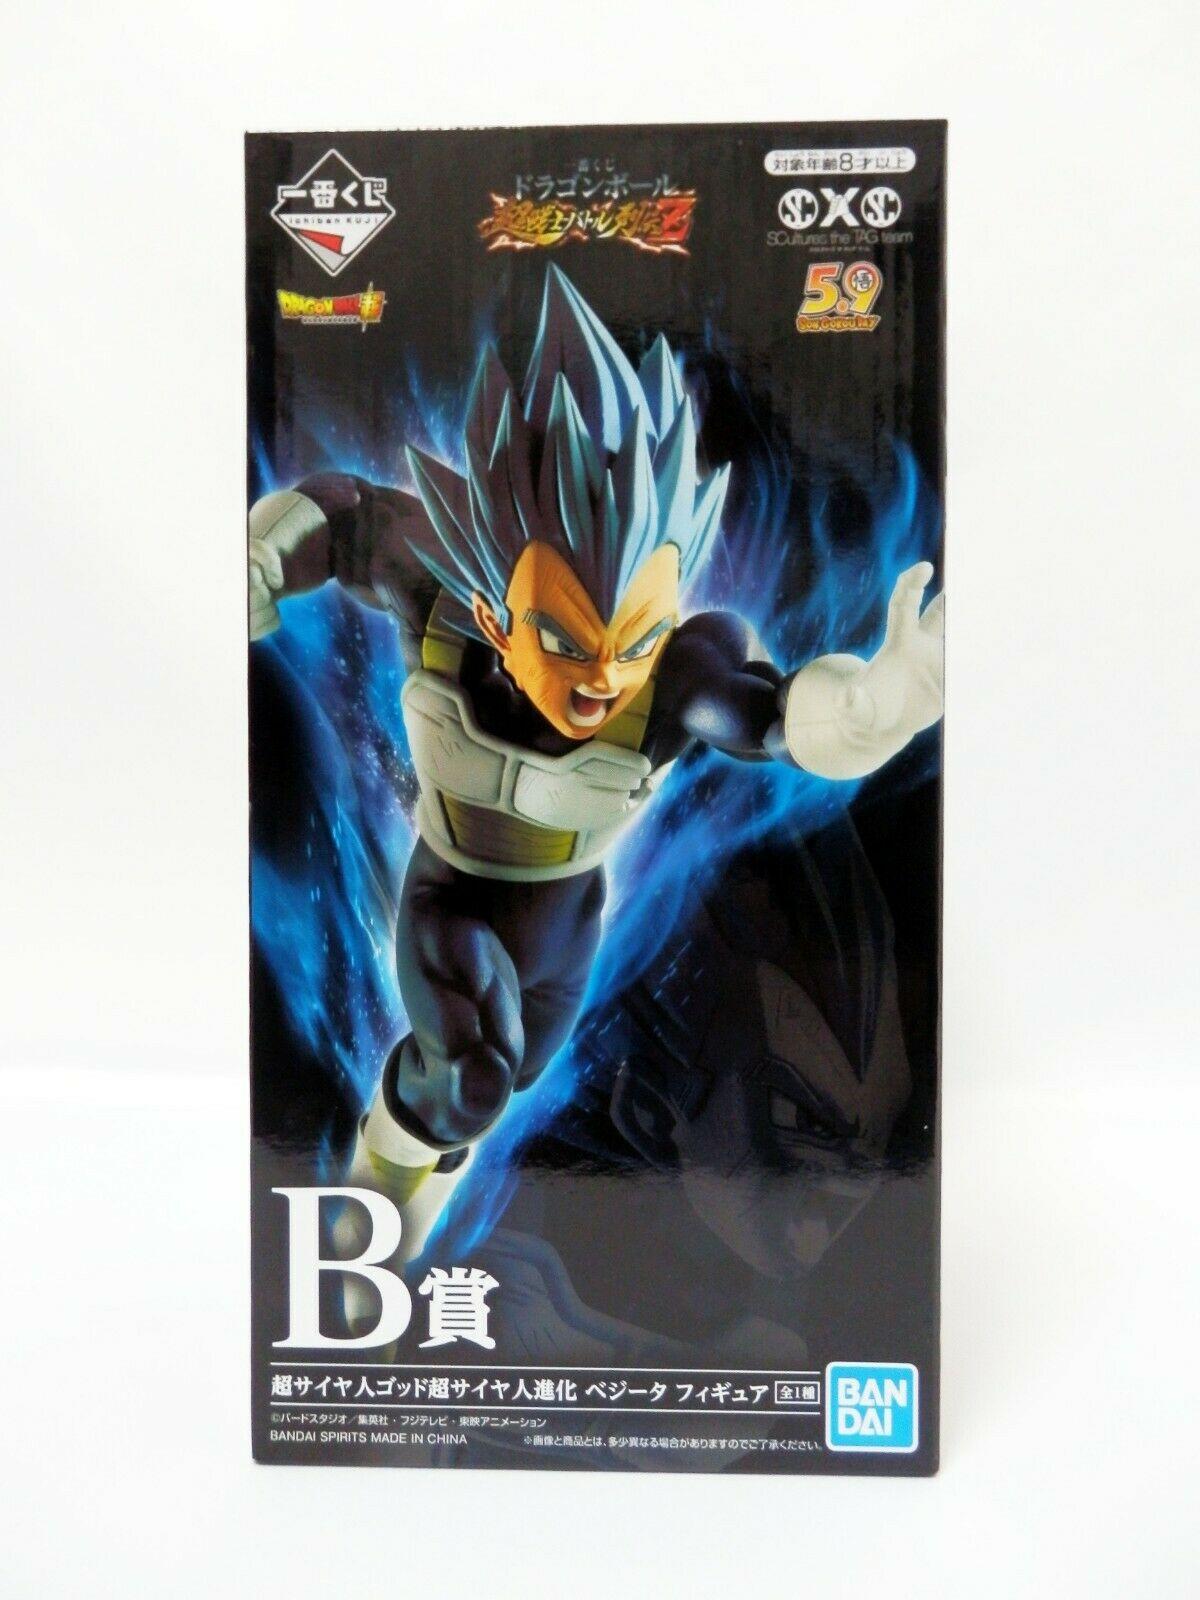 Super Saiyan God Vegeta Figure, Ichiban Kuji B Prize, Dragon Ball, Battle Retsuden, Bandai